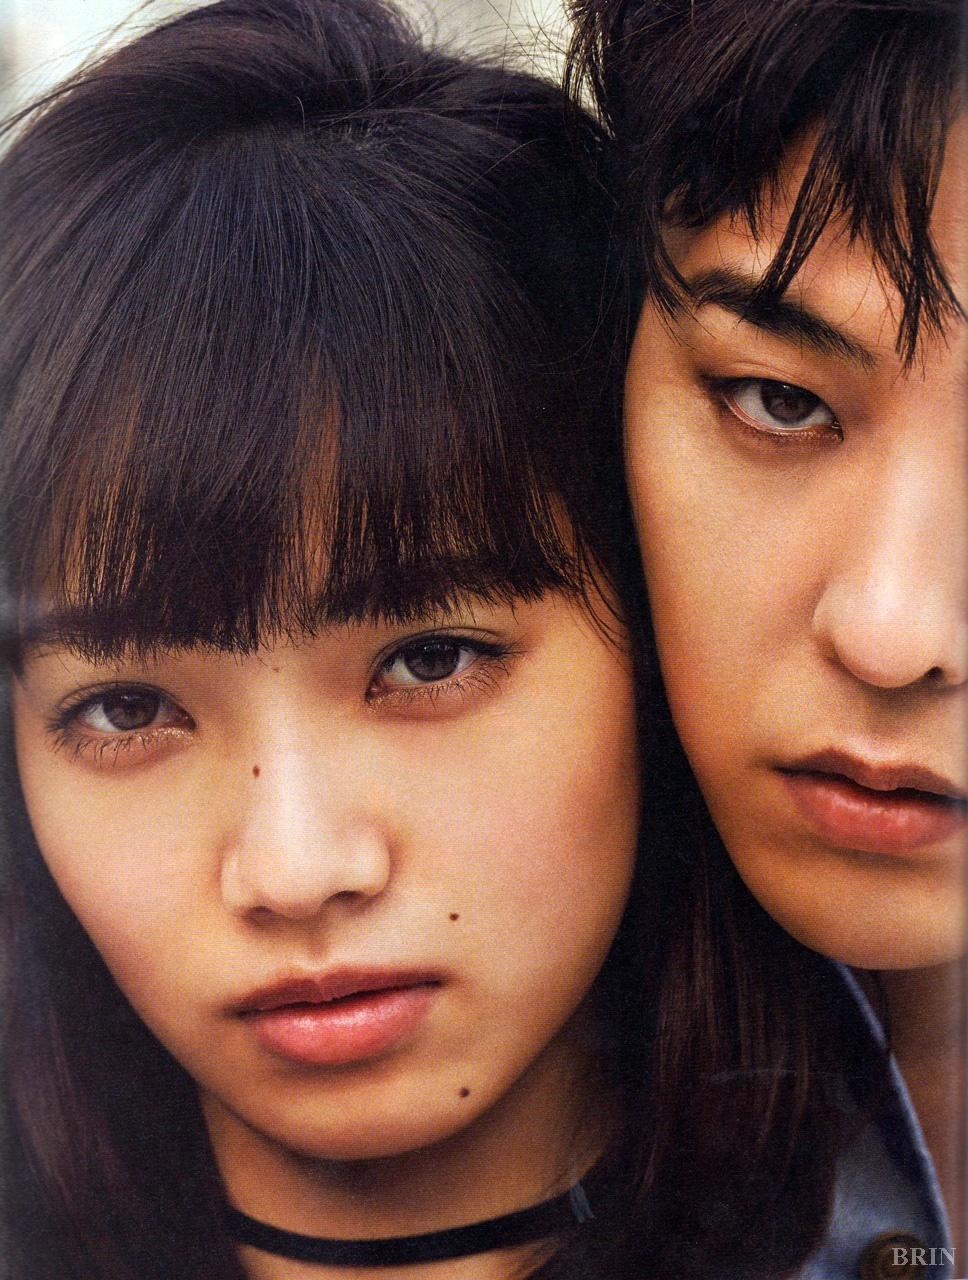 who is g-dragon's new girlfriend, nana komatsu? we found out - koreaboo